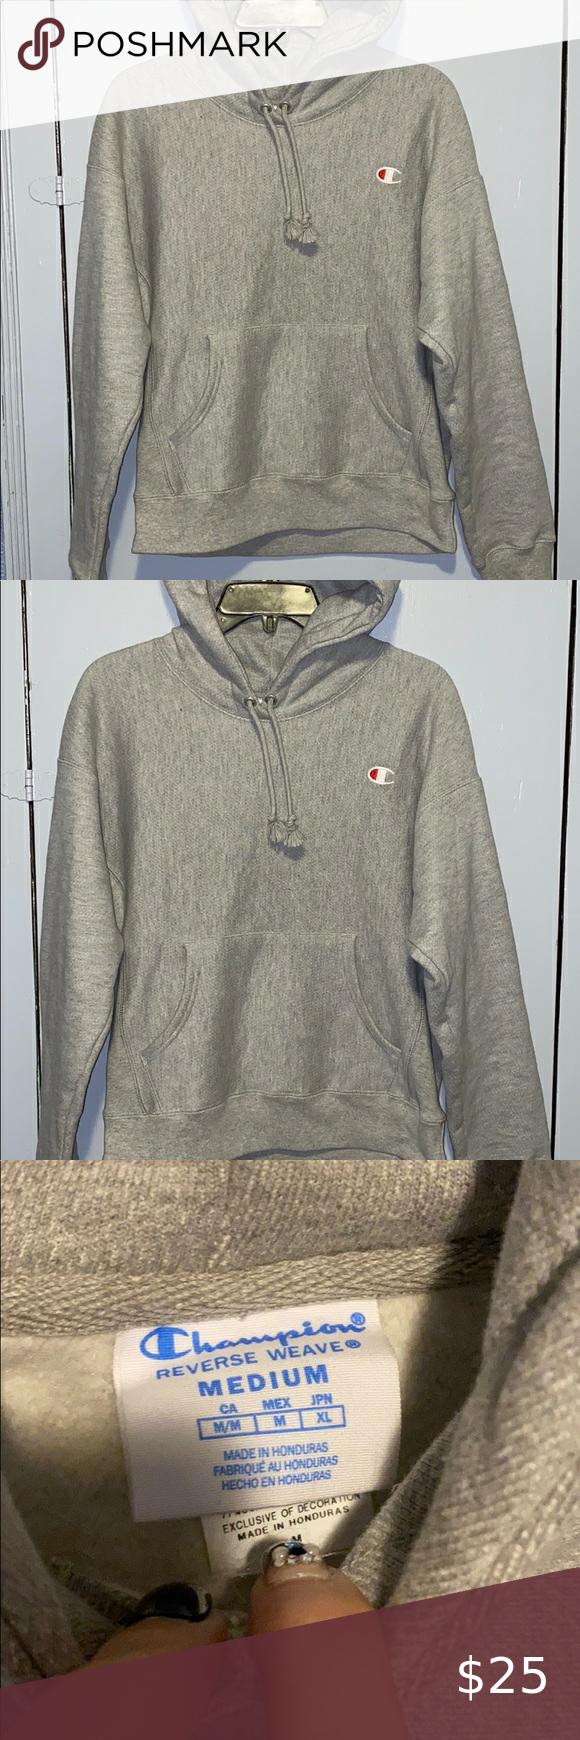 Champion Sweatshirt Champion Sweatshirt Grey Champion Sweatshirt Sweatshirts [ 1740 x 580 Pixel ]